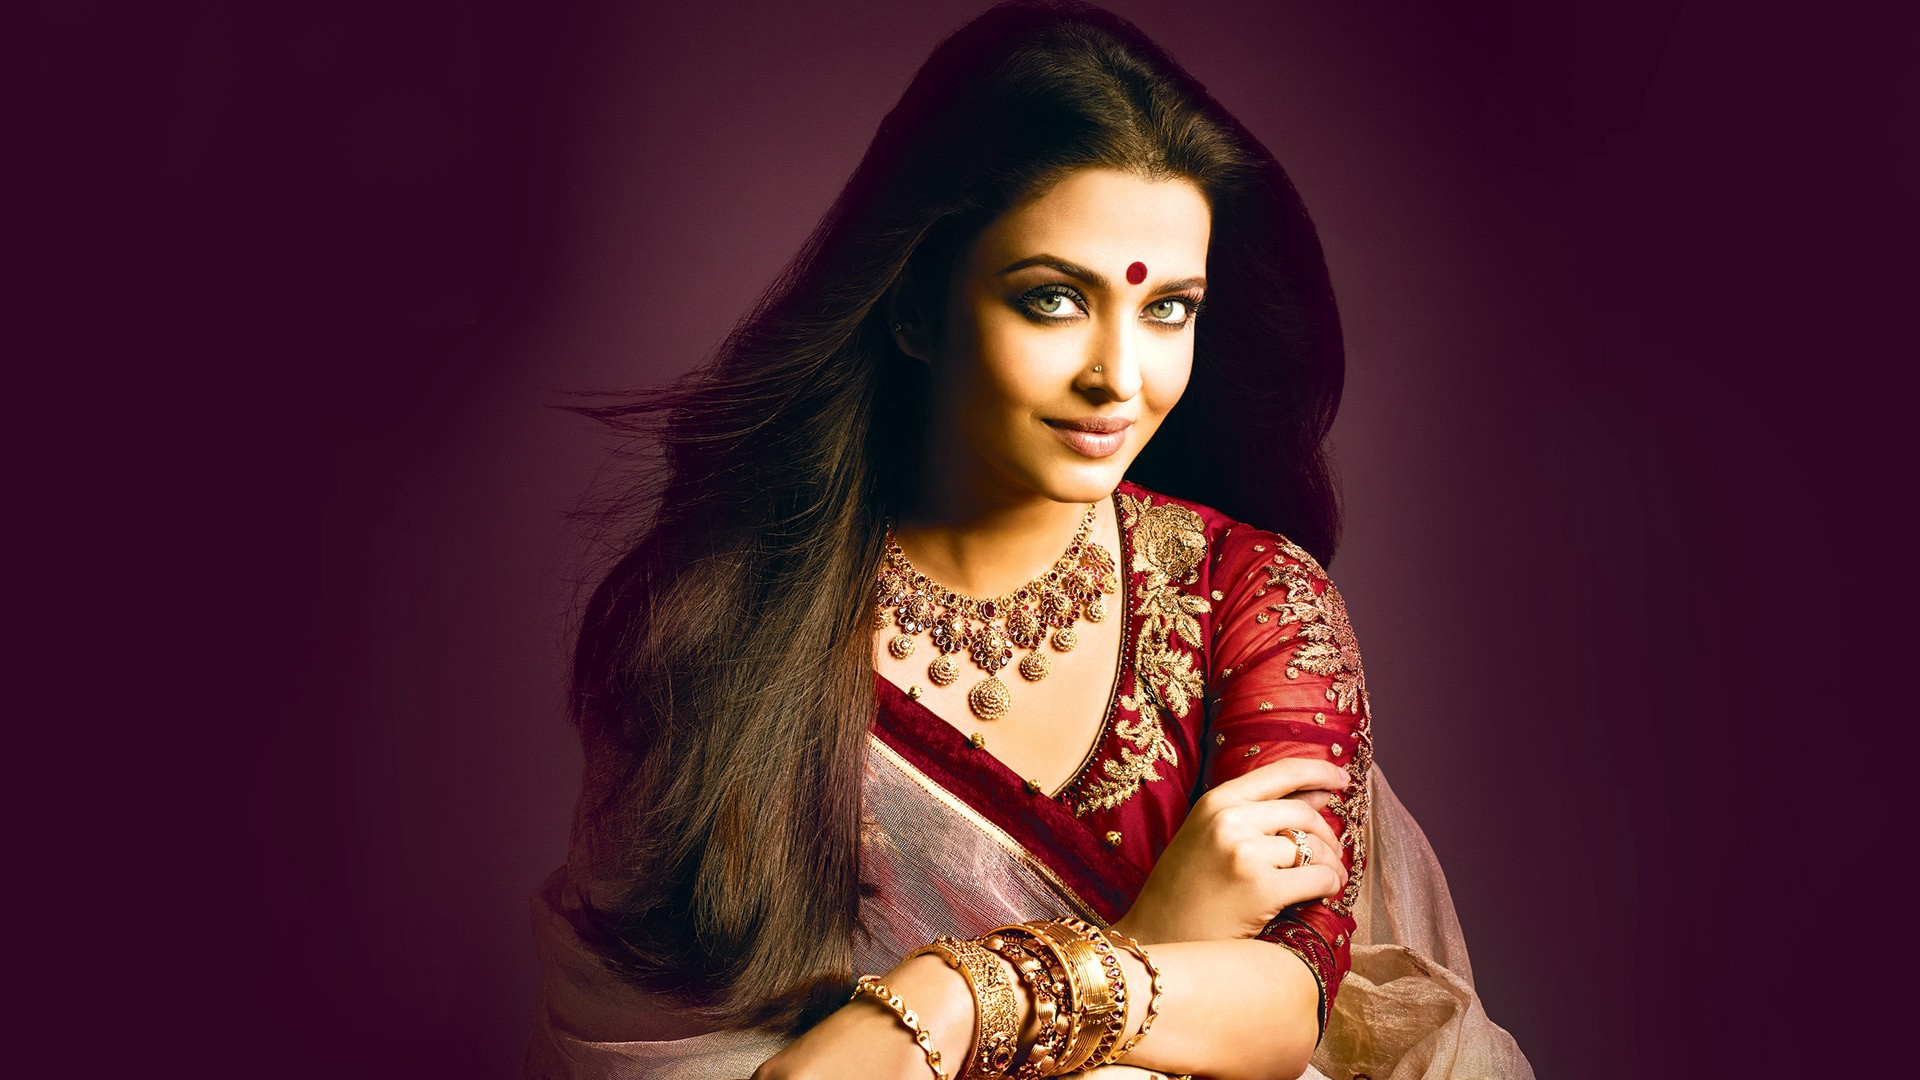 Aishwarya Rai Hd Wallpaper Download: 4K Aishwarya Rai Wallpapers High Quality